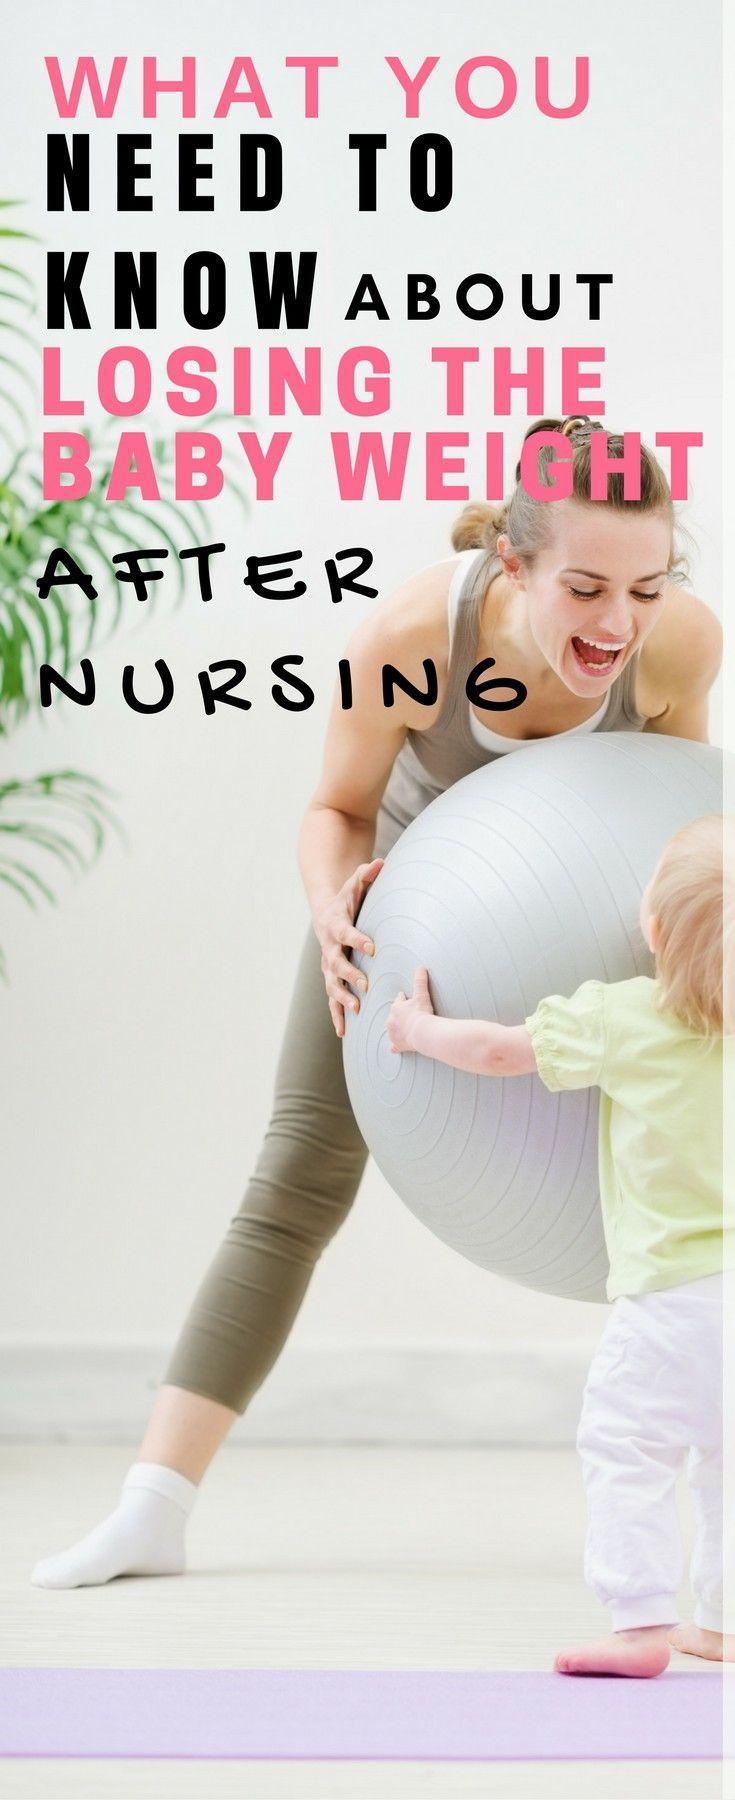 Best 25+ Pregnancy after loss ideas on Pinterest ...